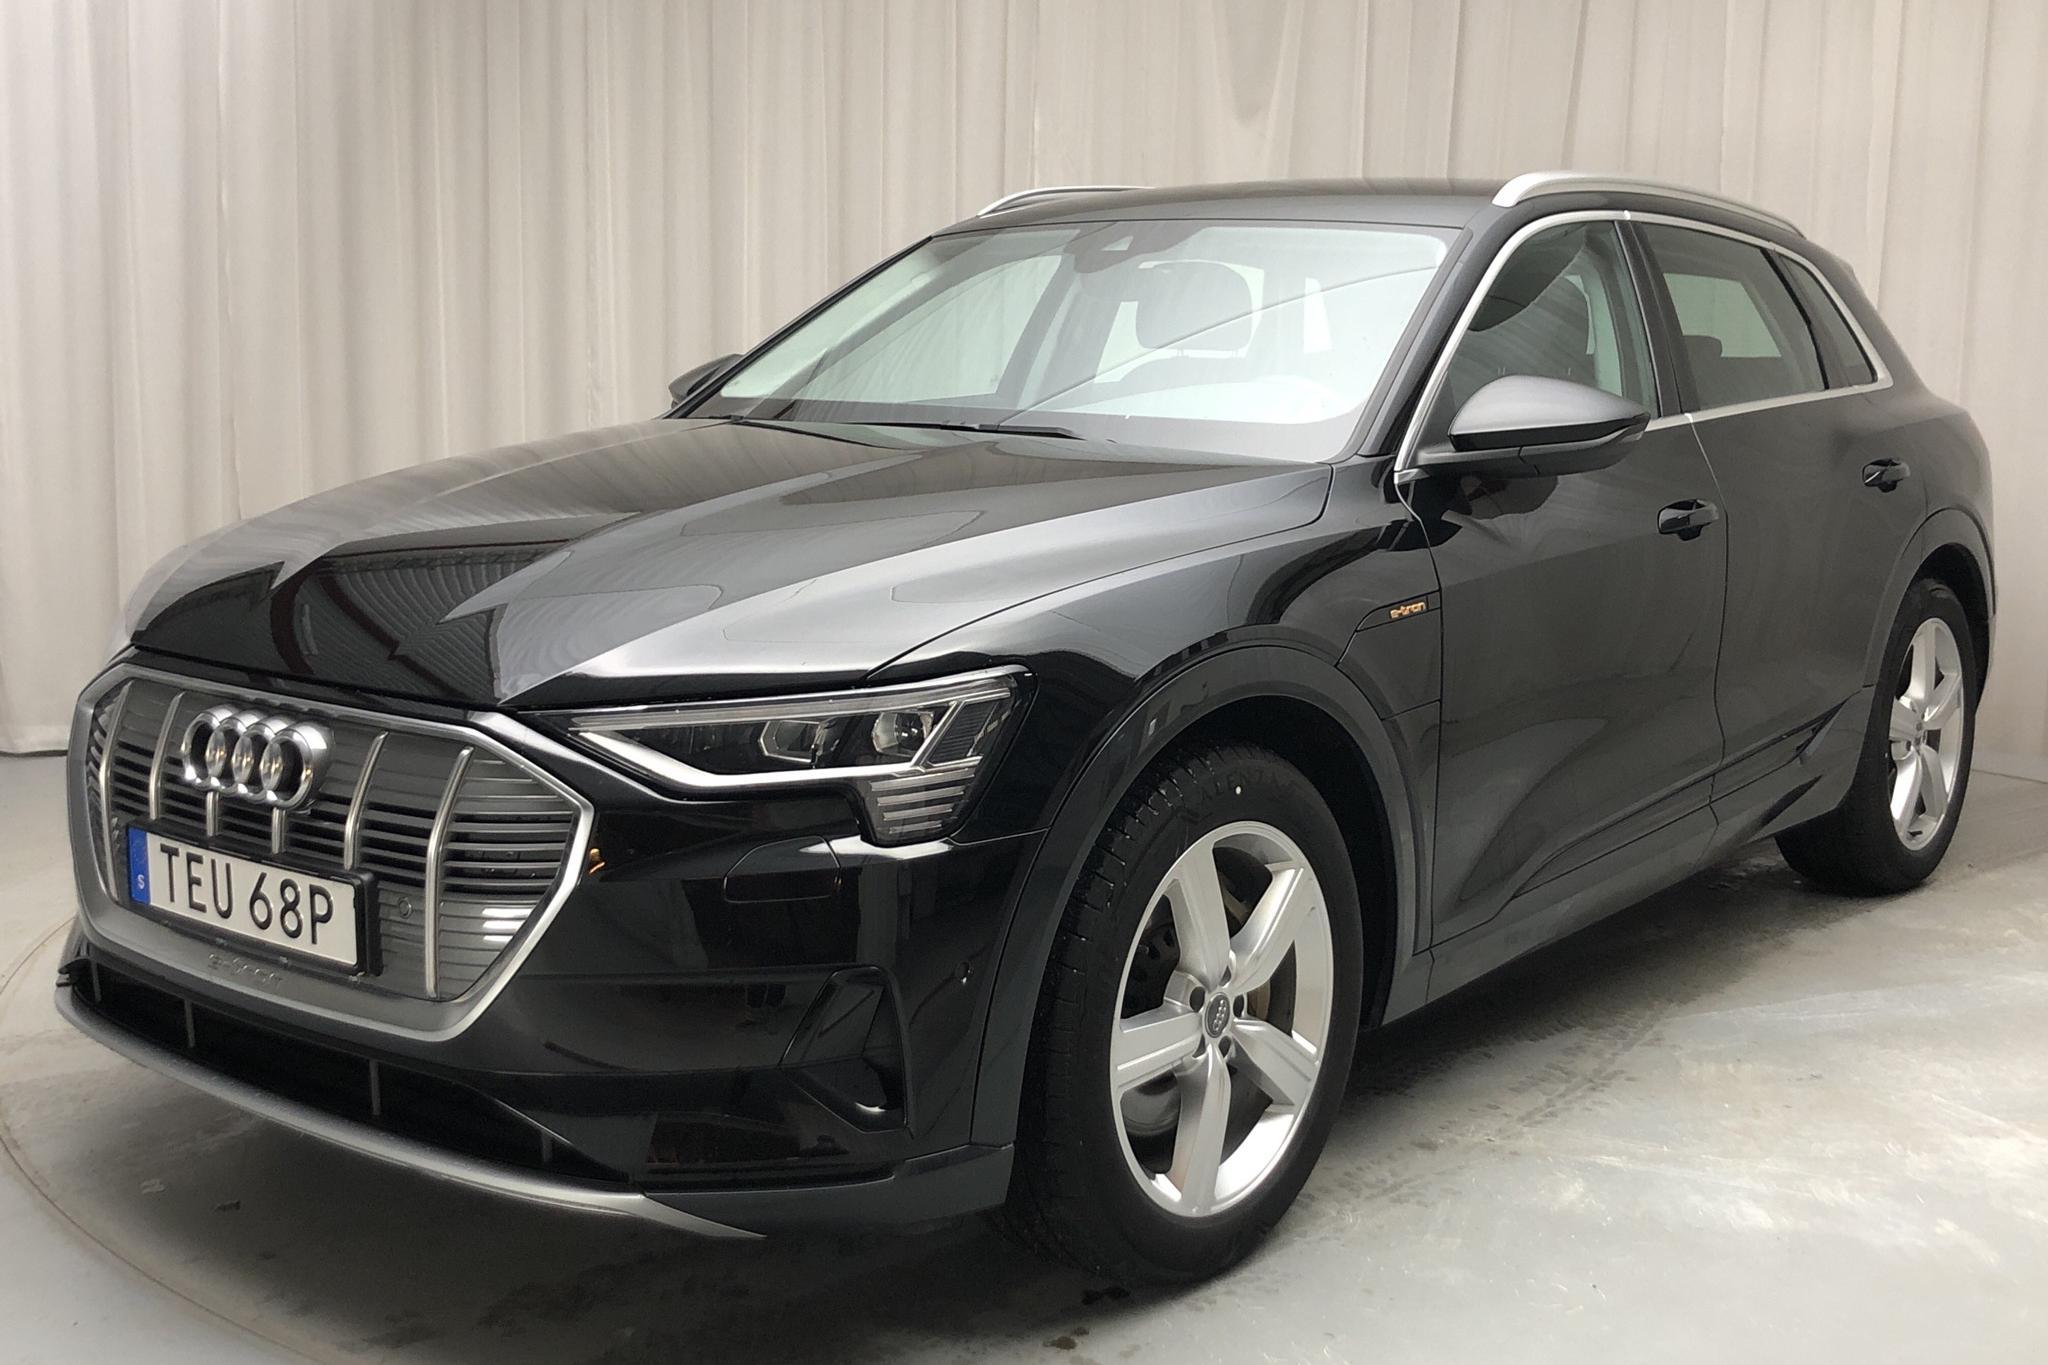 Audi e-tron 50 quattro 71 kWh (288hk) - 2 243 mil - Automat - svart - 2020